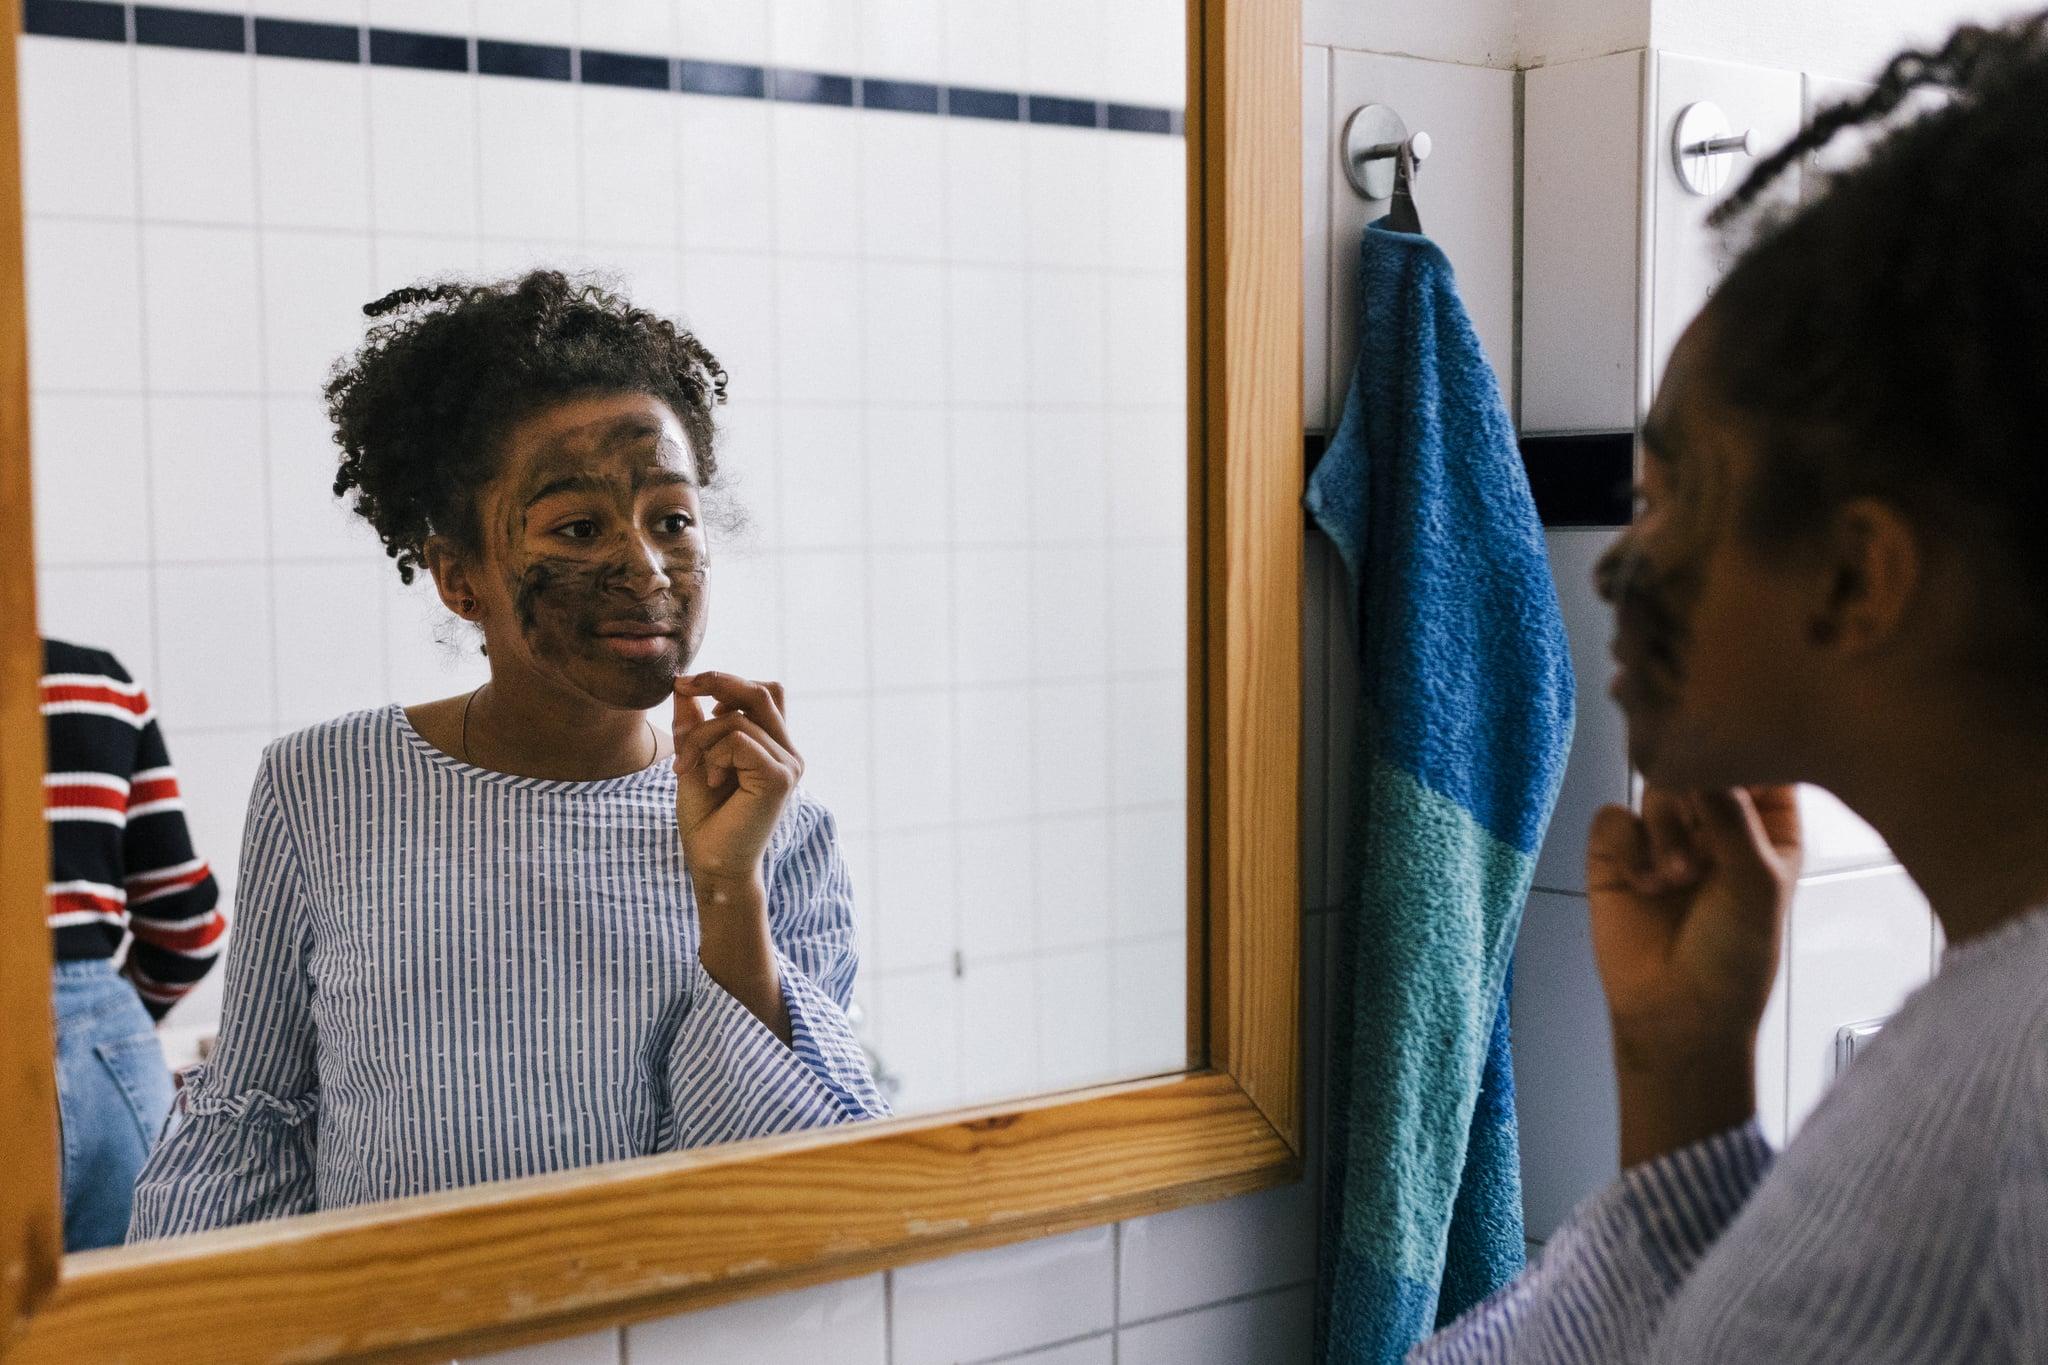 Black tween in applying facial mask while looking into a bathroom mirror.